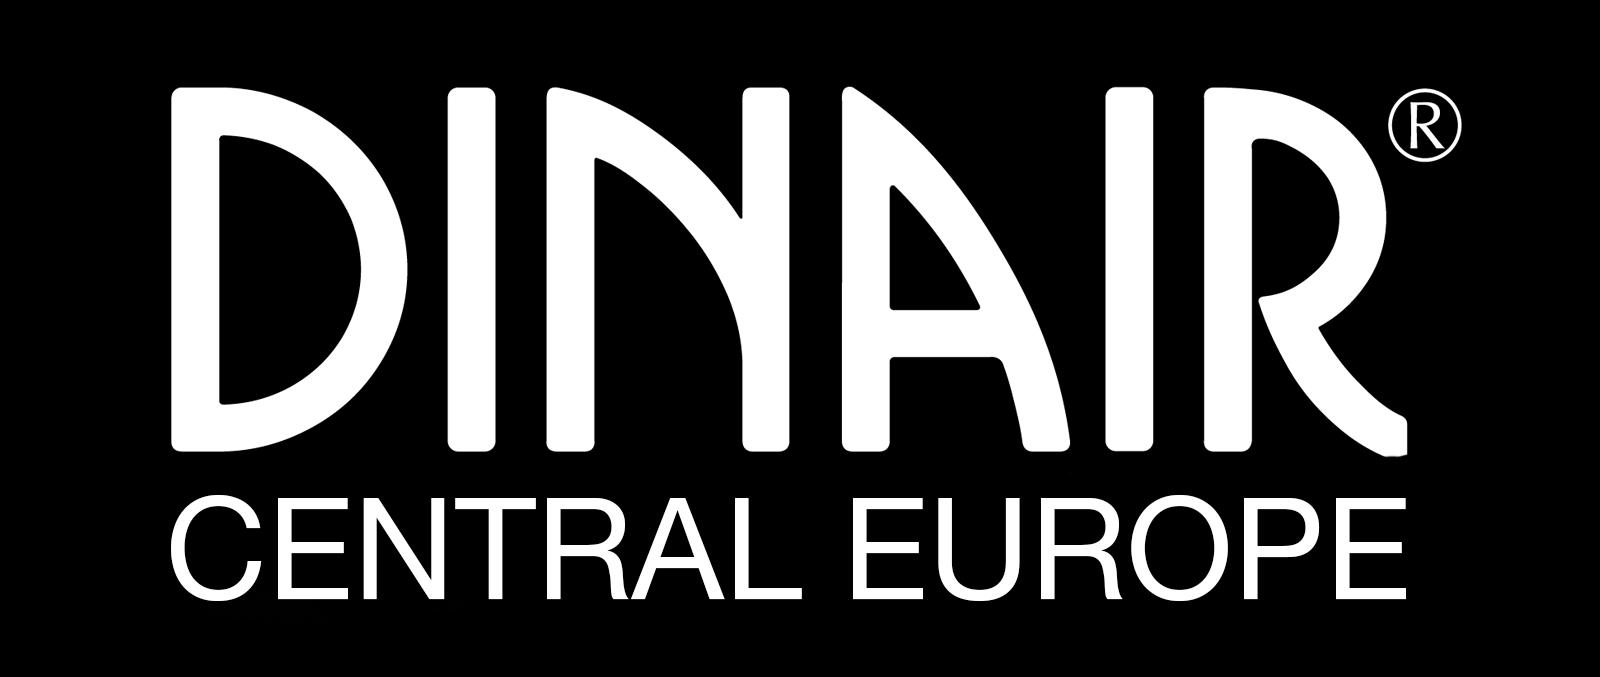 Dinair Central Europe Ltd.